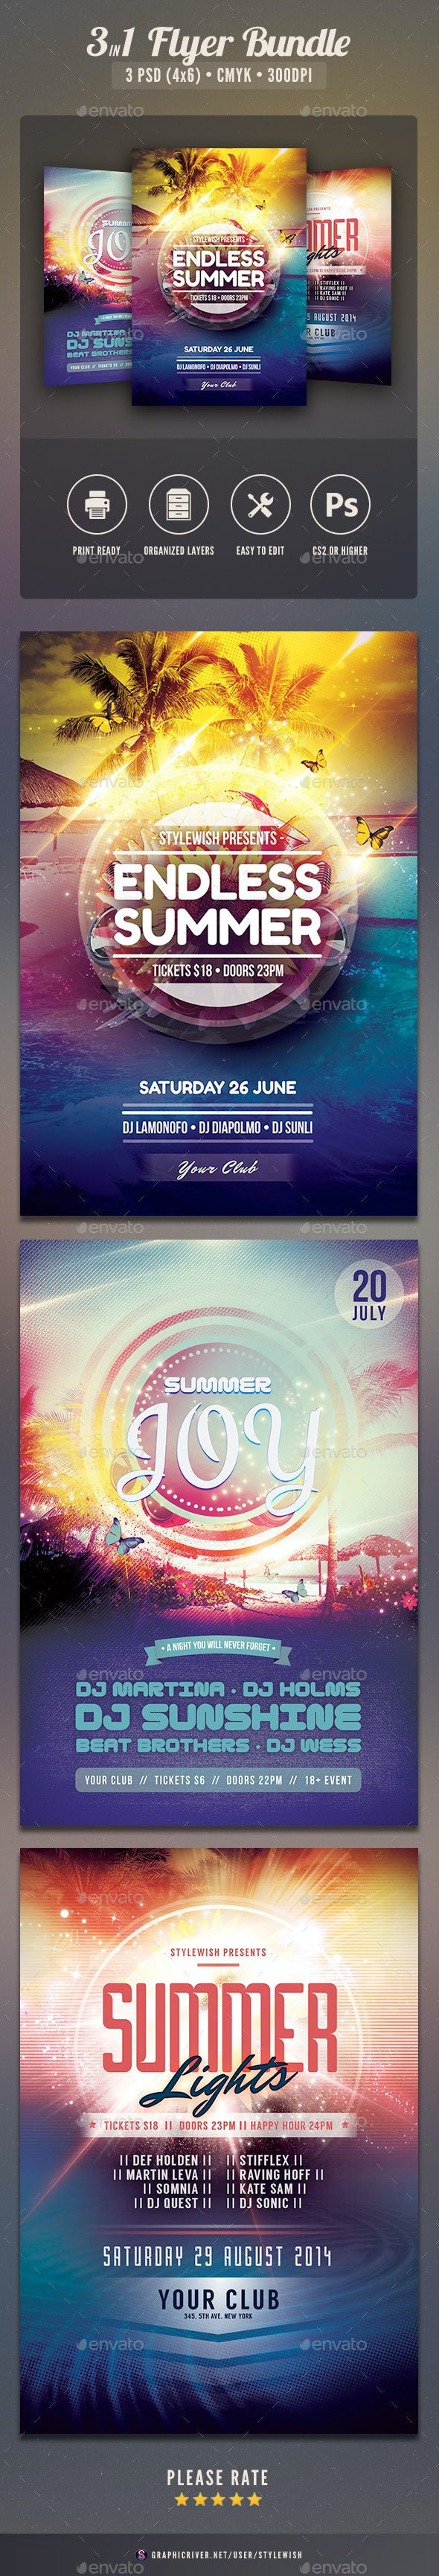 Summer Flyer Bundle Vol.06 - Clubs & Parties Events